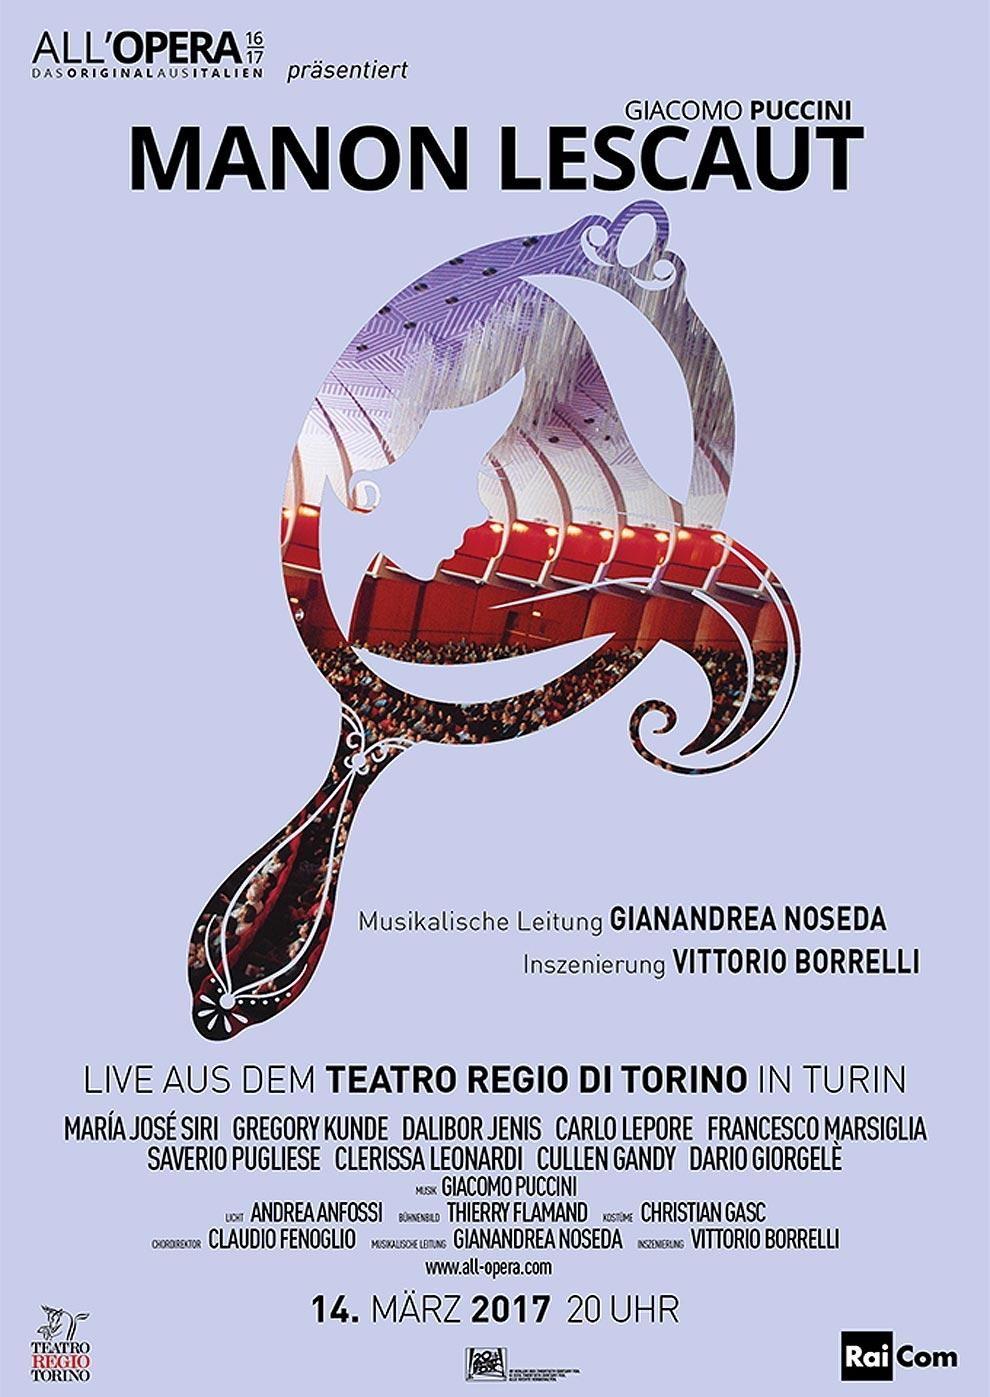 All Opera 16/17: Manon Lescaut (Aufzeichnung) (Poster)